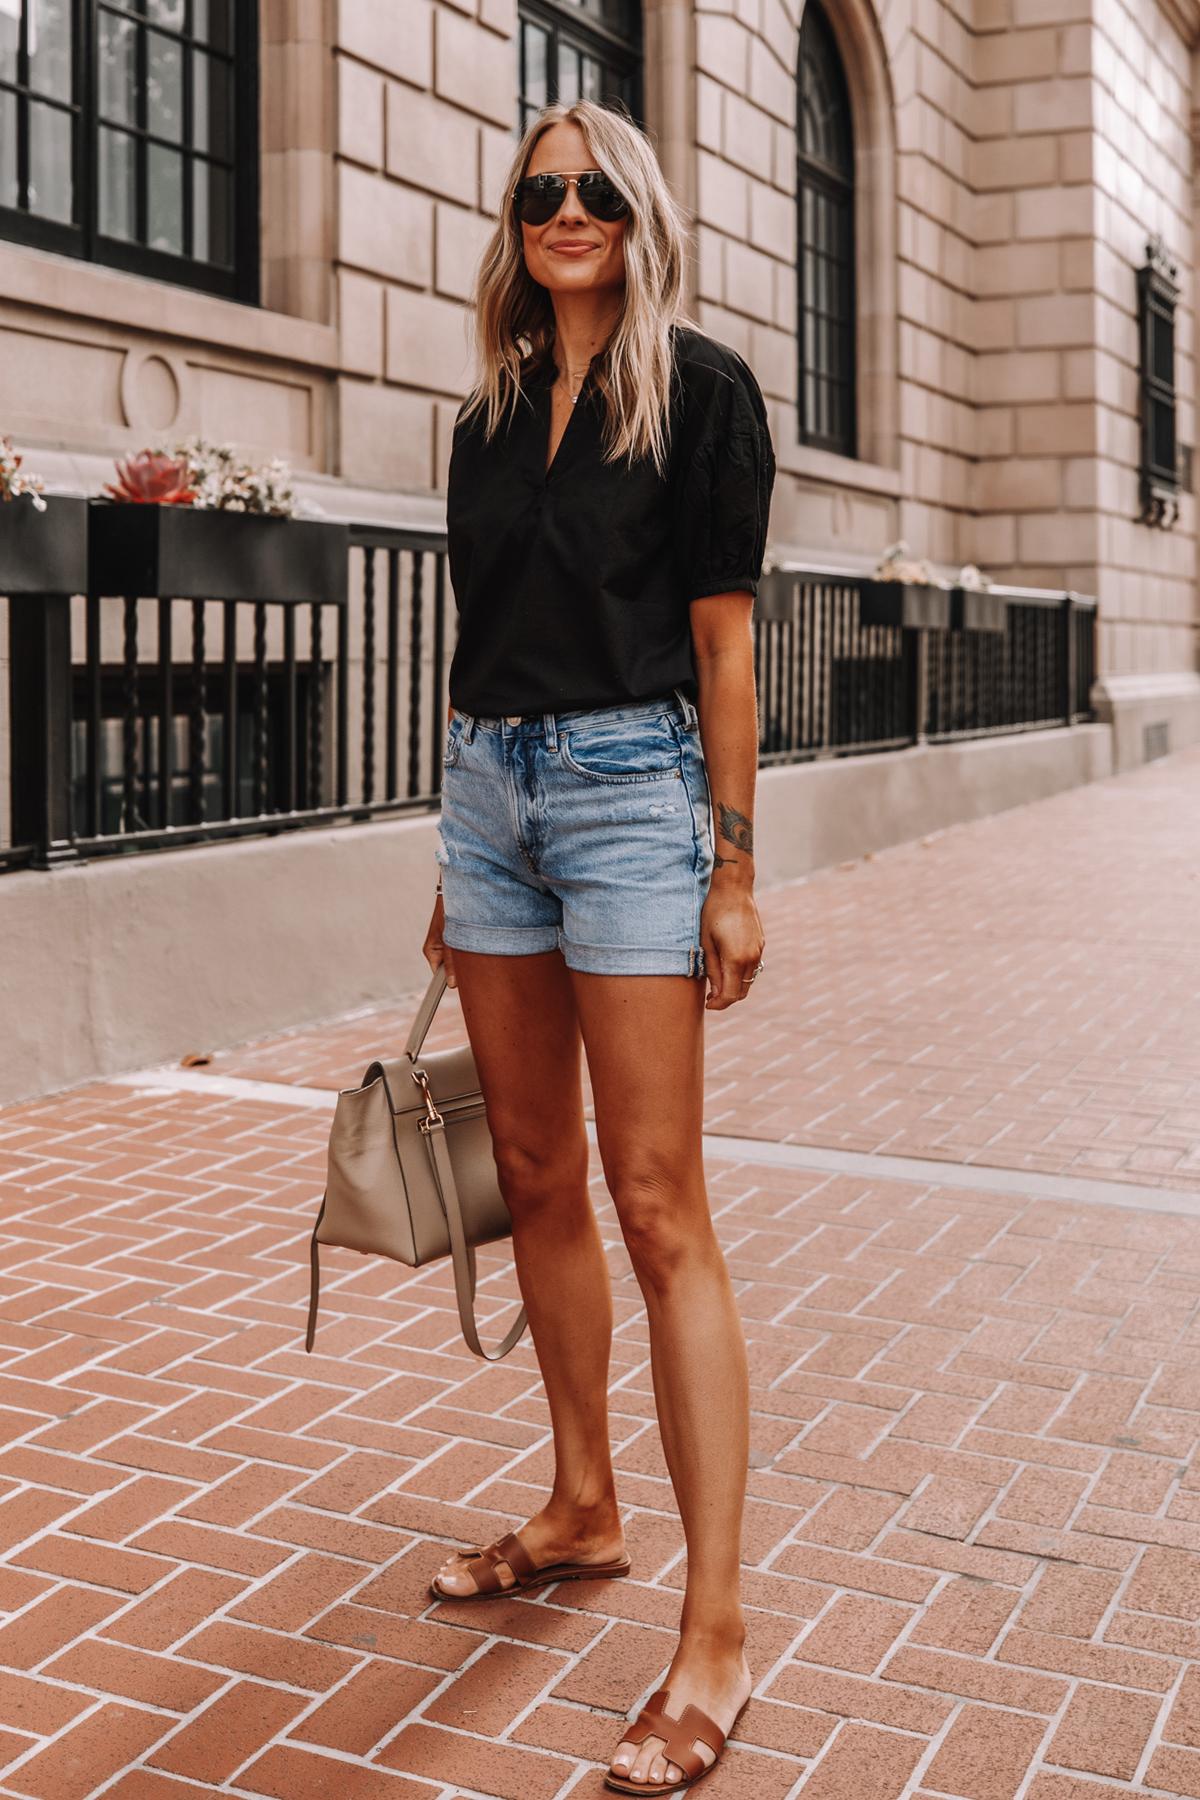 Fashion Jackson Wearing Black Everlane Split Neck Puff Sleeve Air Shirt Everlane Denim Shorts Tan Sandals Summer Outfit 2